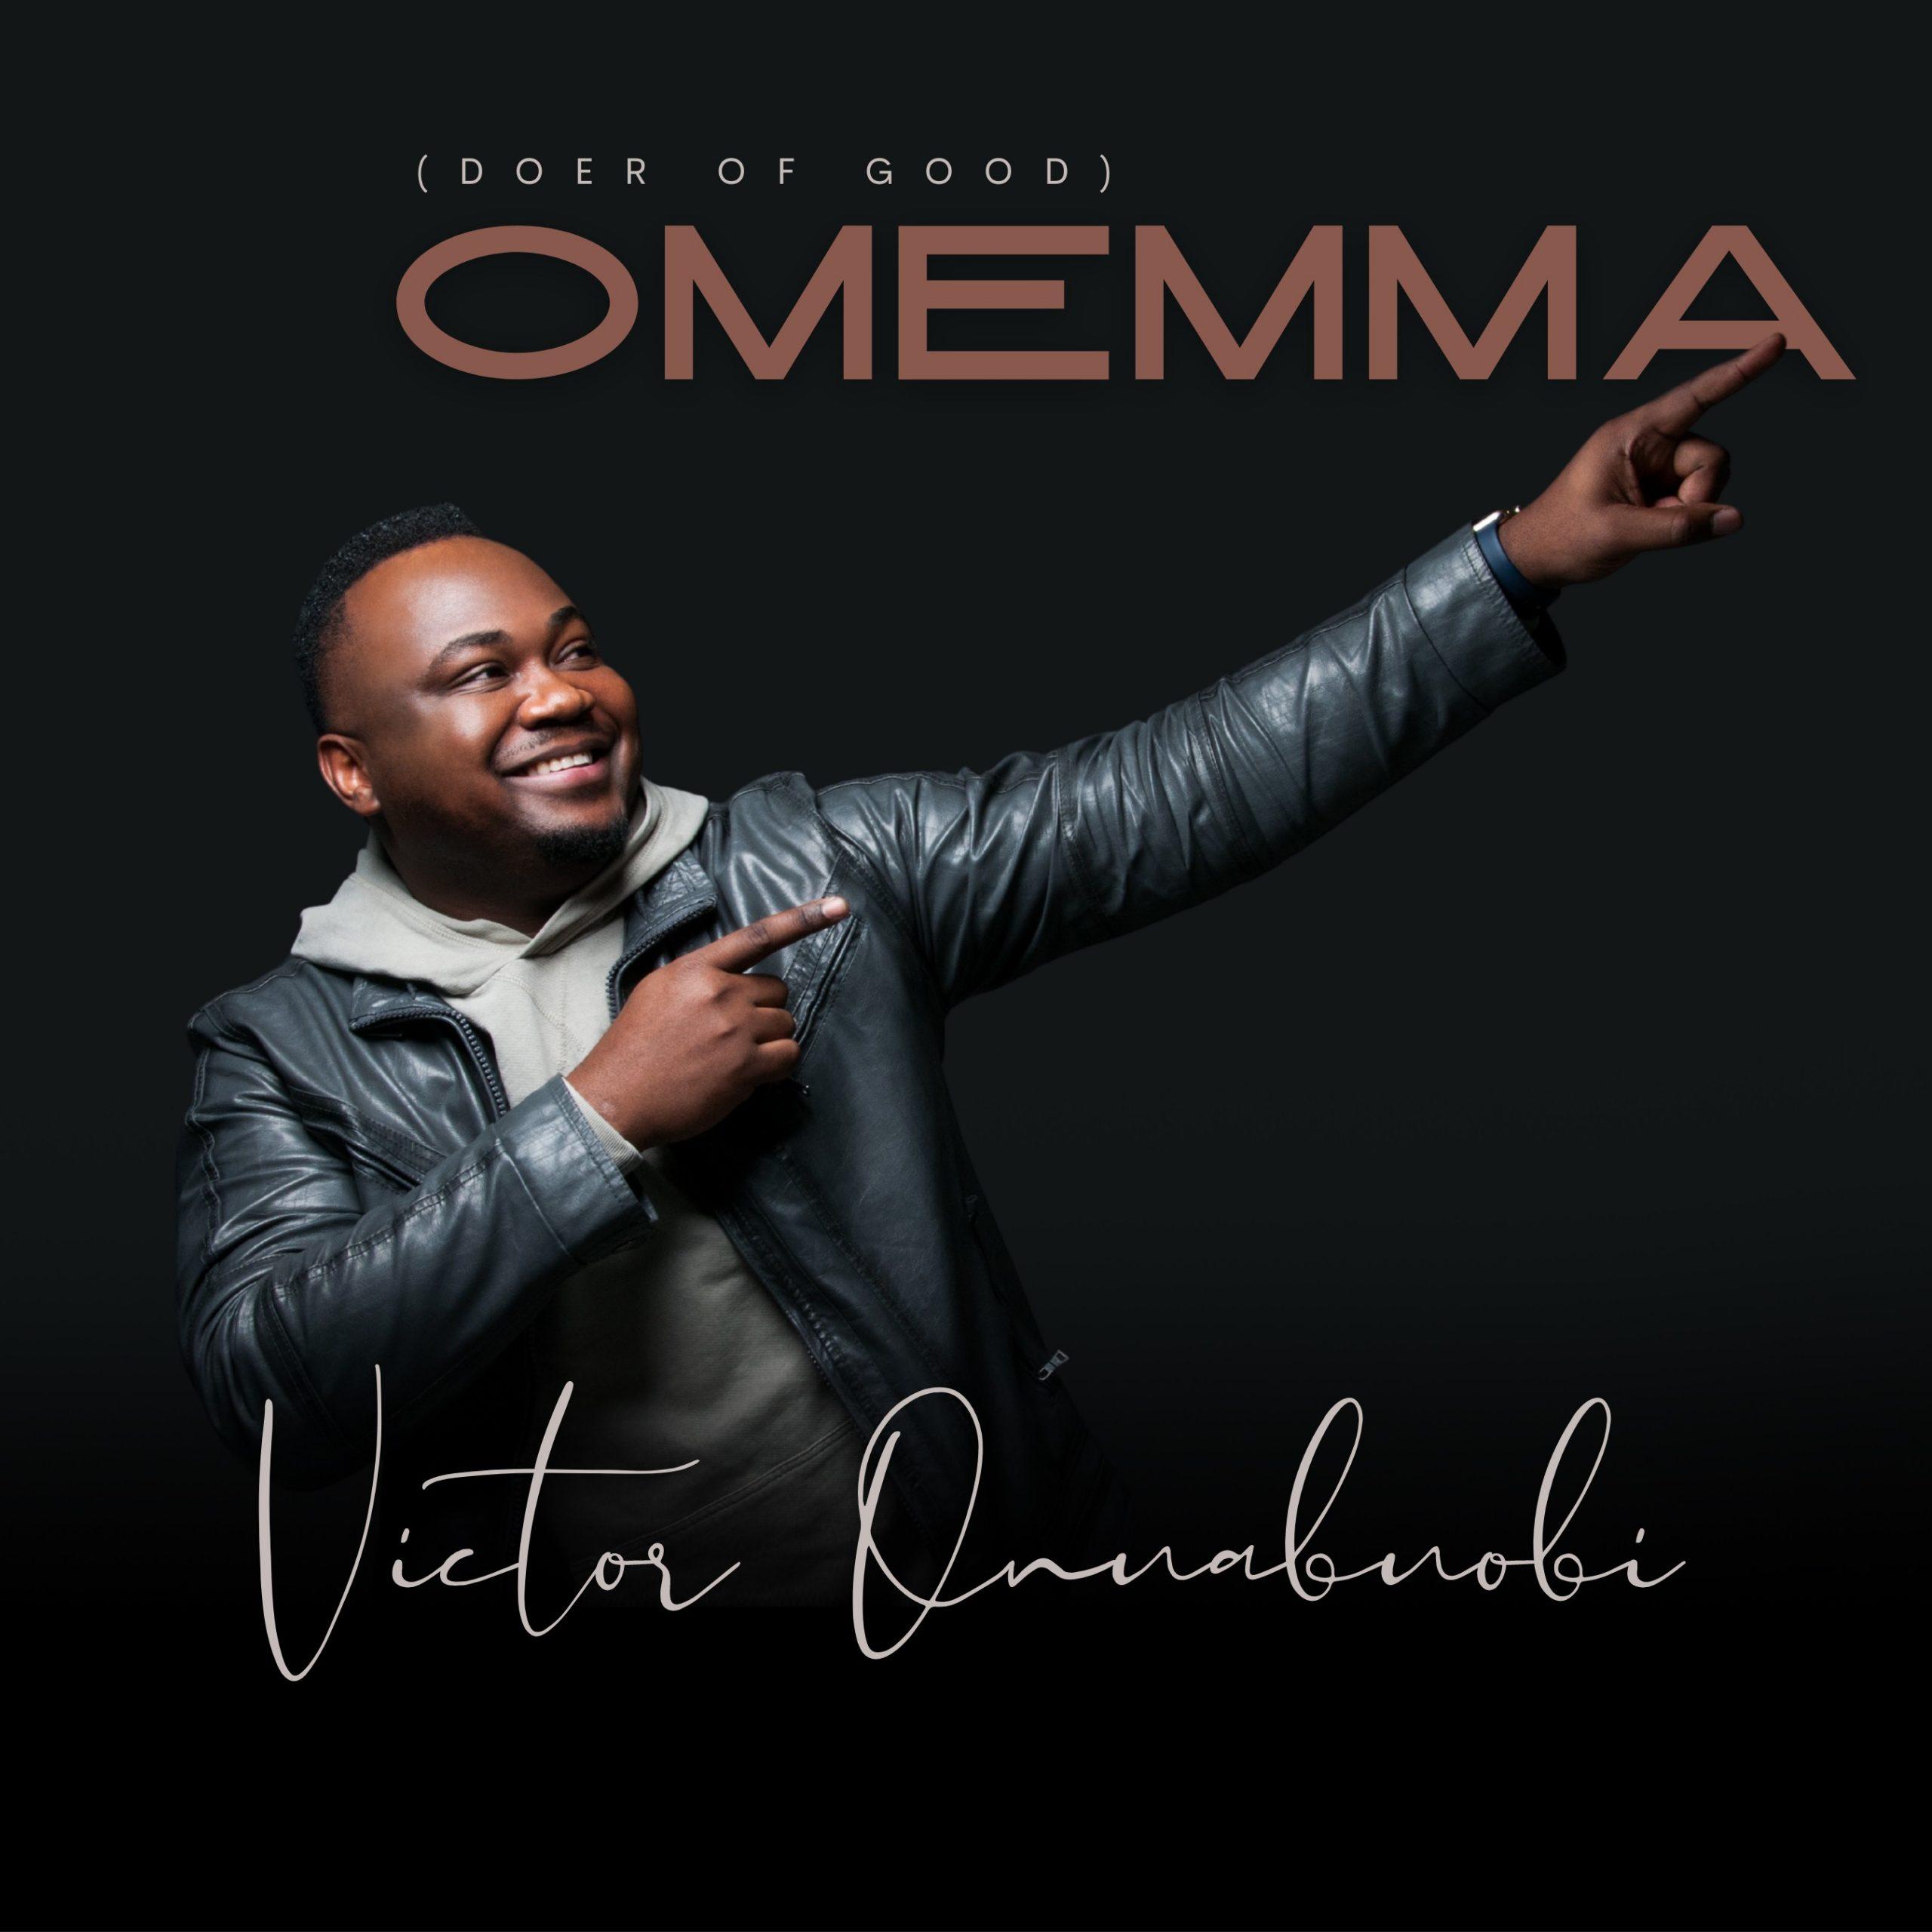 Victor Onuabuobi - Omemma